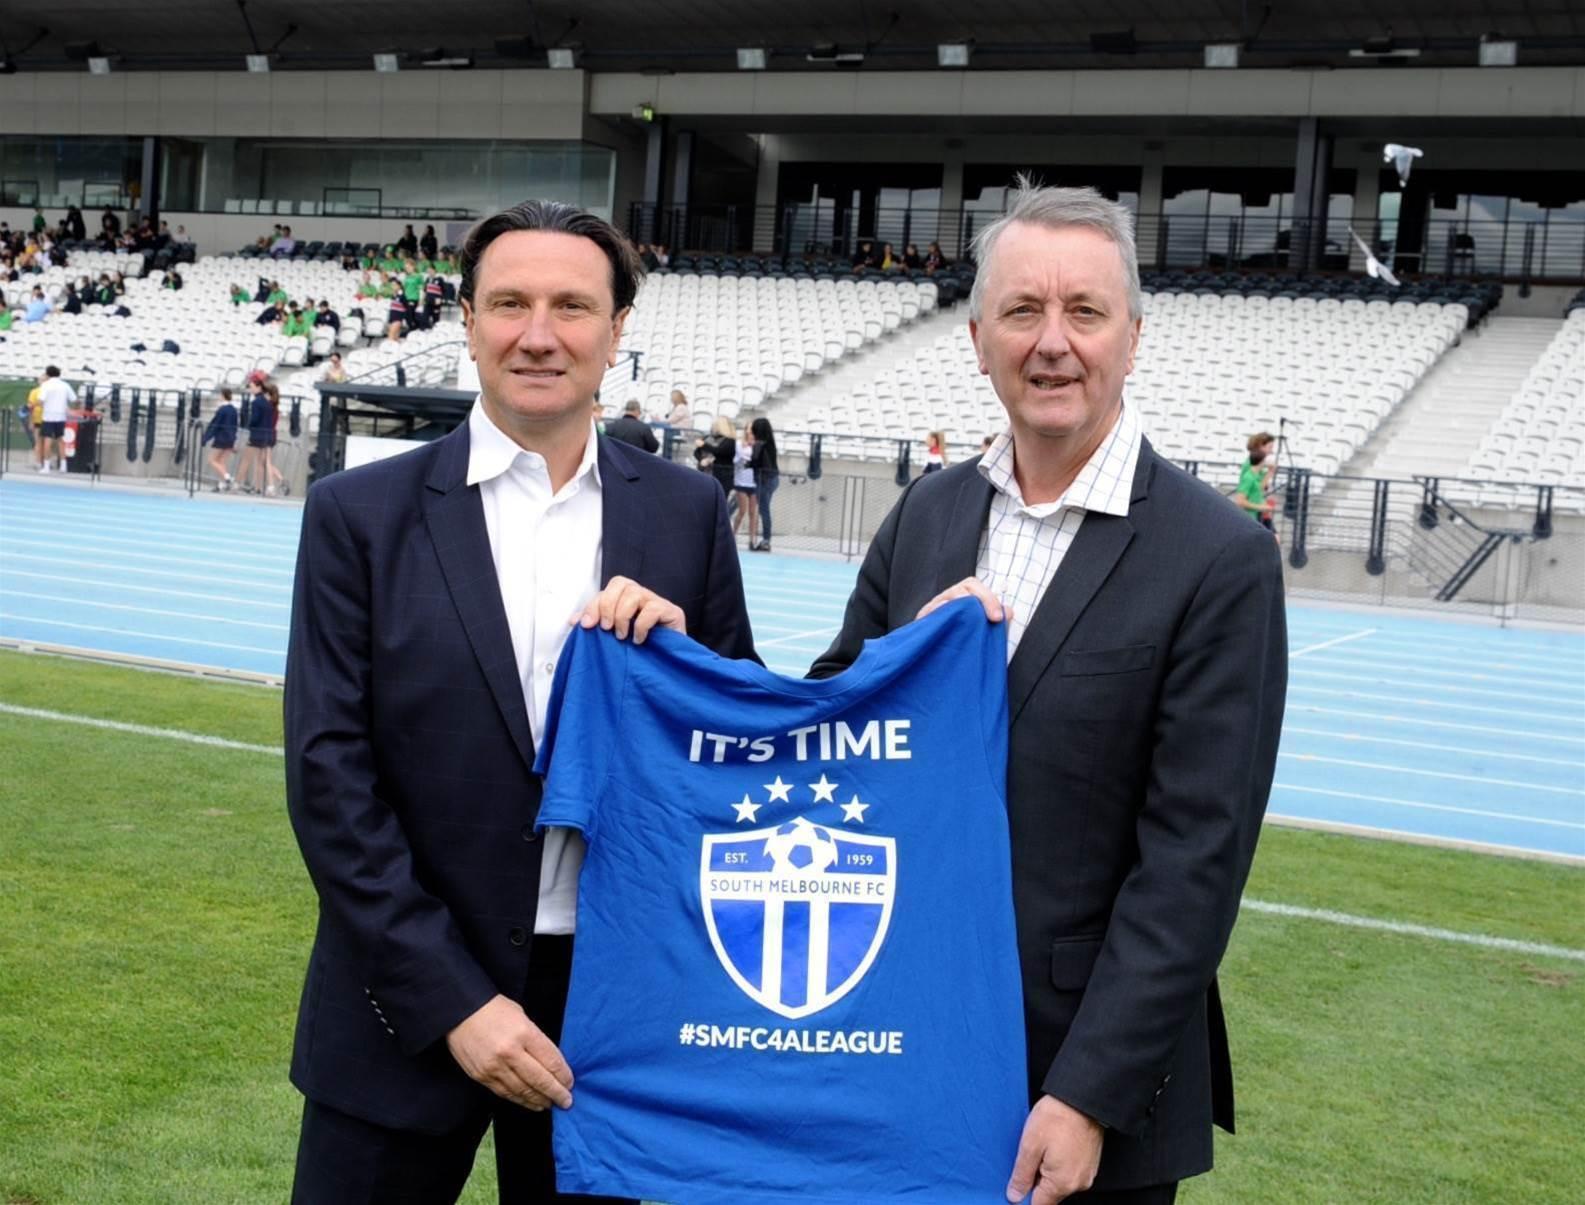 South Melbourne bid gets political